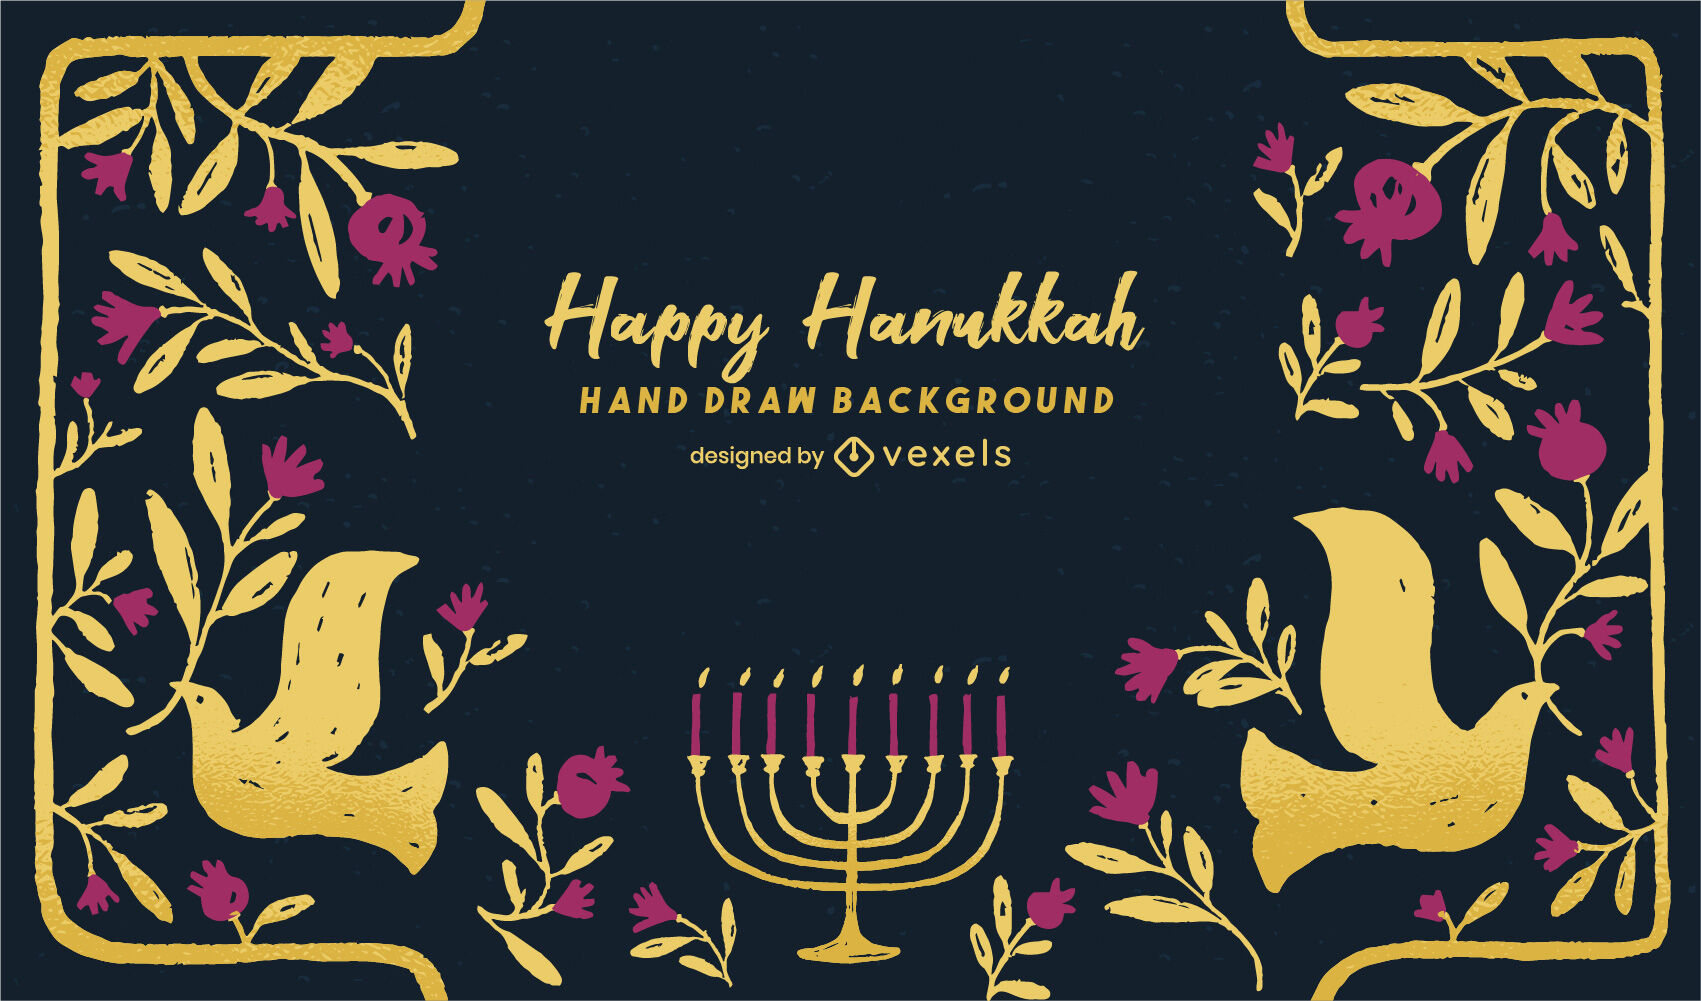 Happy hanukkah background gradient